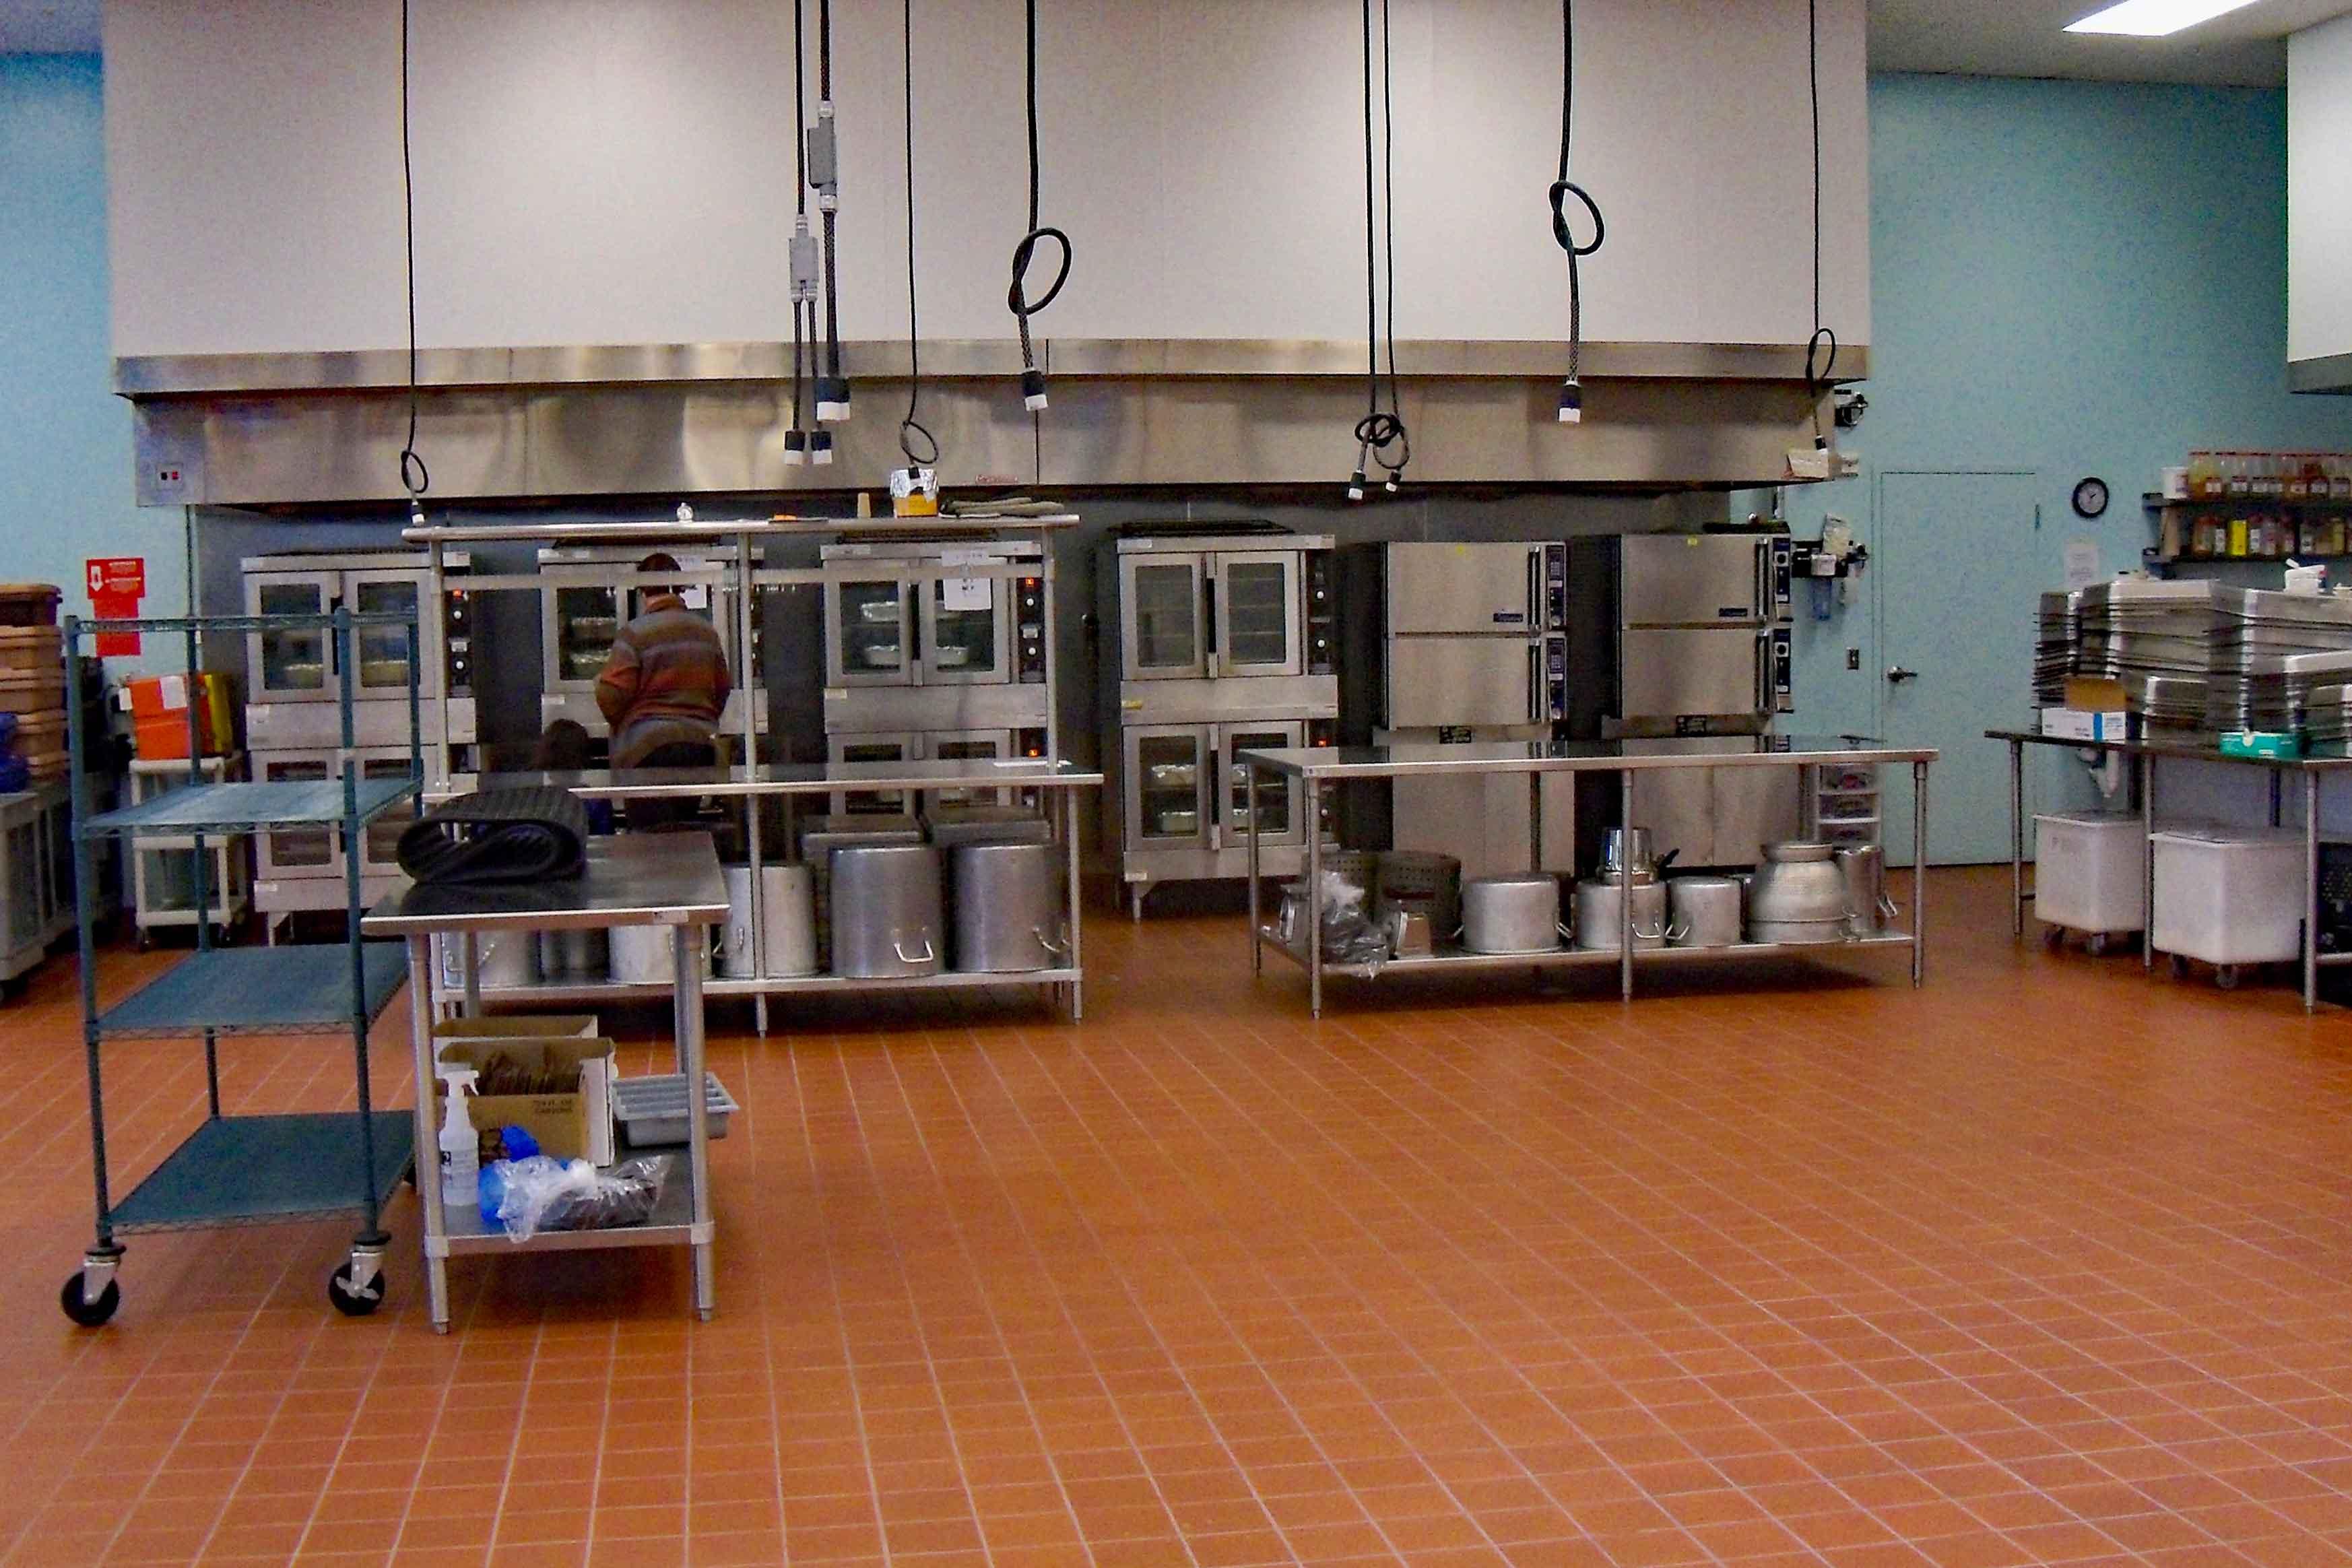 Commercial Kitchen, Restaurant & Coffee Shop for sale Gold Coast Queensland Australia